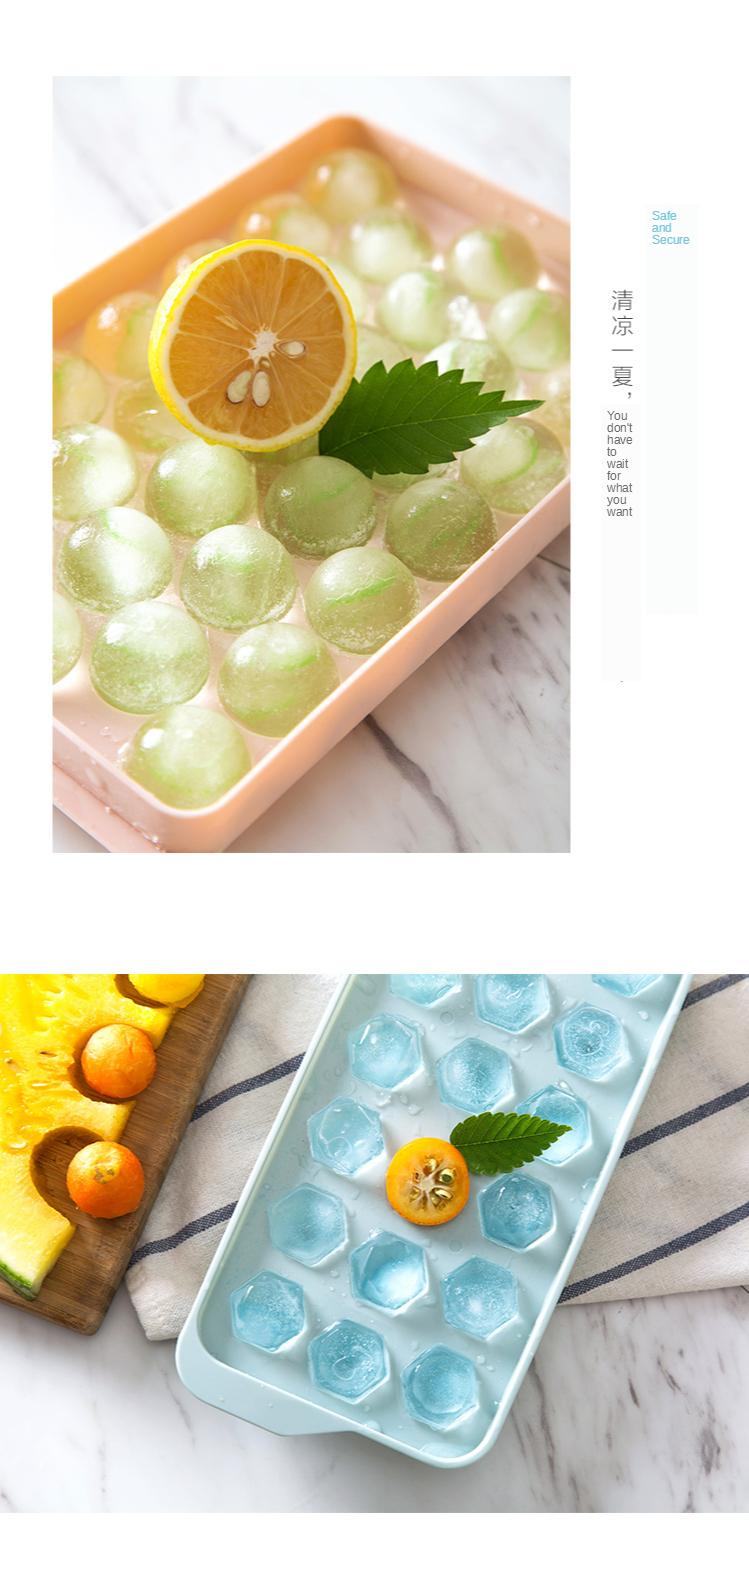 Homemade ice hockey frozen ice cube mold refrigerator ice box spherical ice tray creative home making ice tray box ice box 10